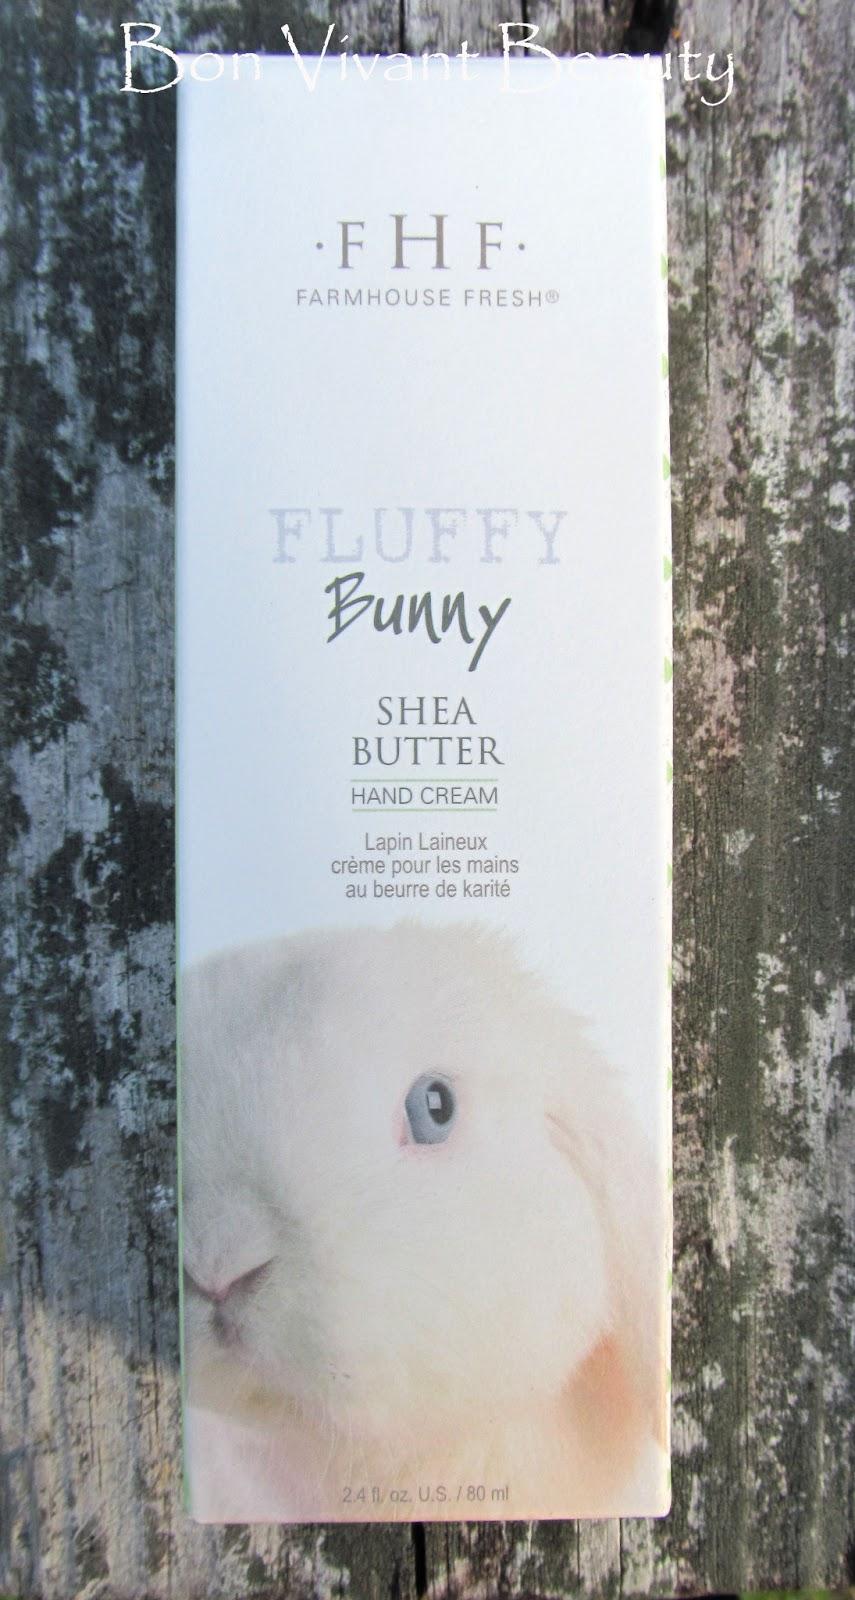 Bon Vivant Beauty Fluffy Bunny Shea Butter Hand Cream By Farmhouse Fresh